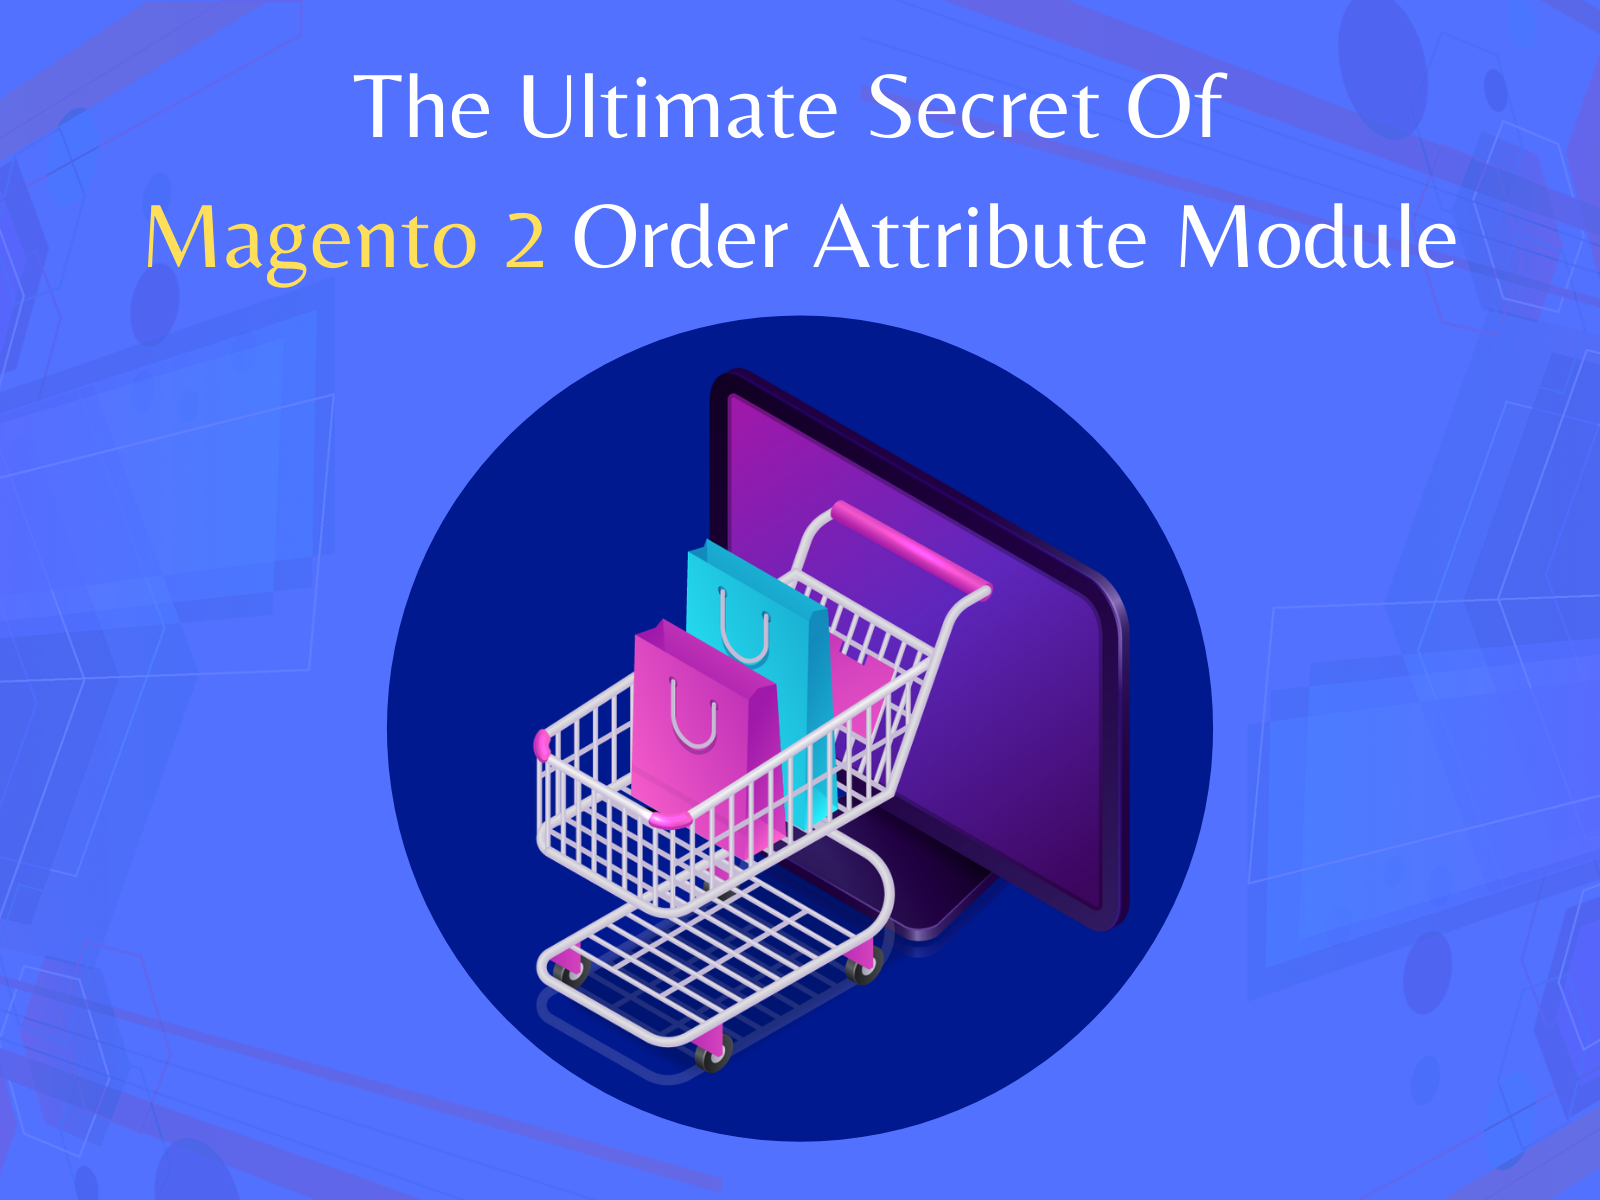 The Ultimate Secret Of Magento 2 Order Attribute Module